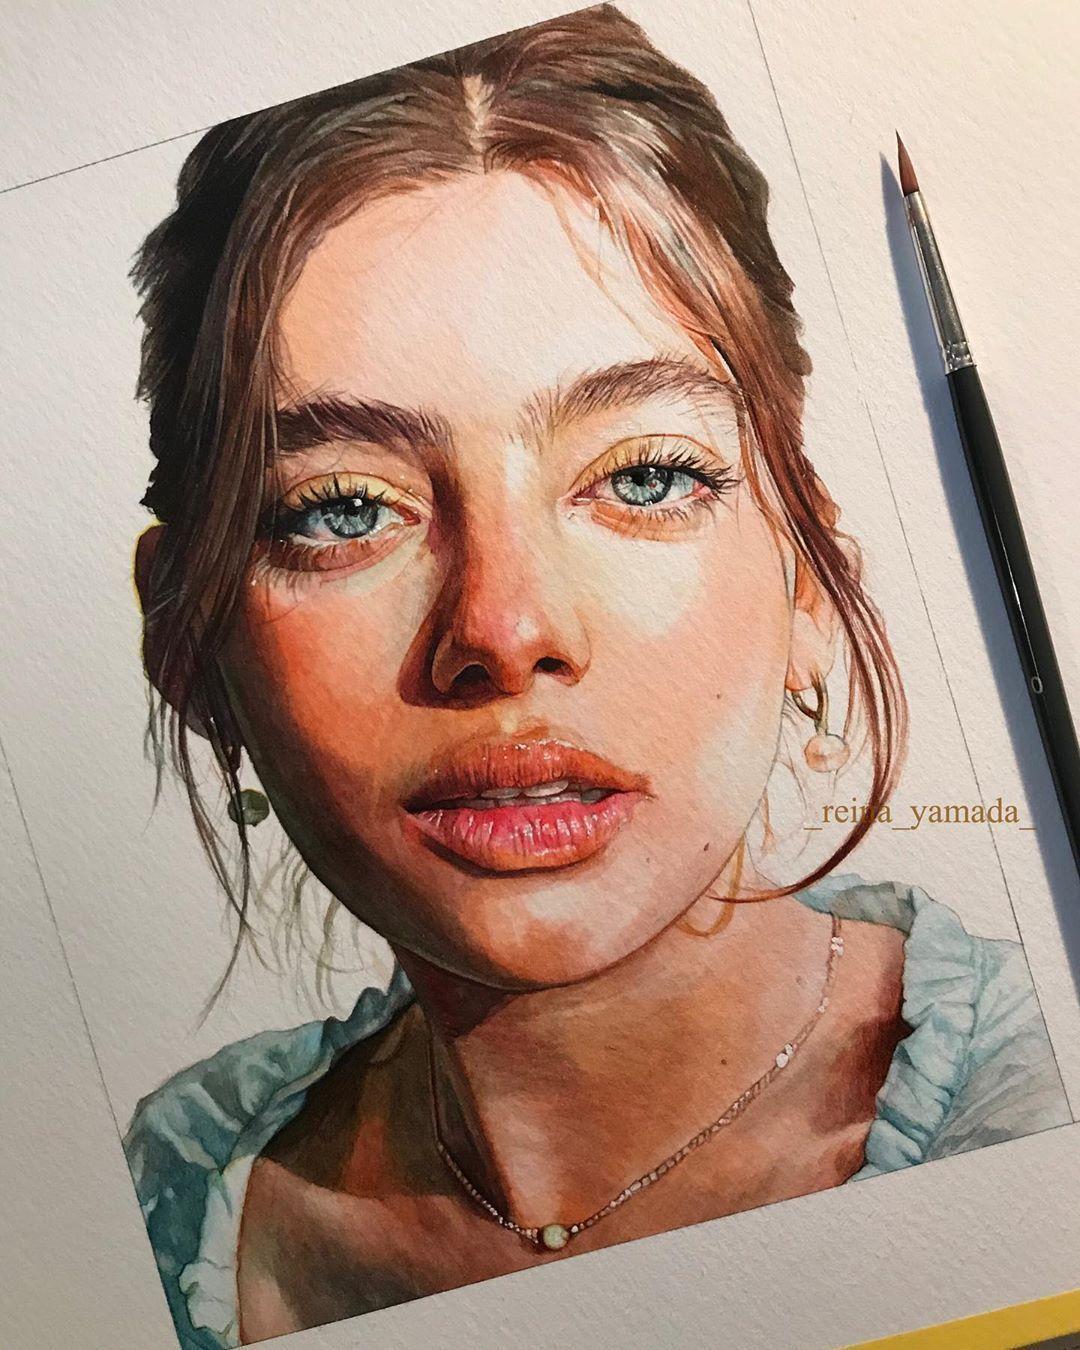 Watercolor Art By Reina Yamada | ARTWOONZ Artwoonz - Watercolor